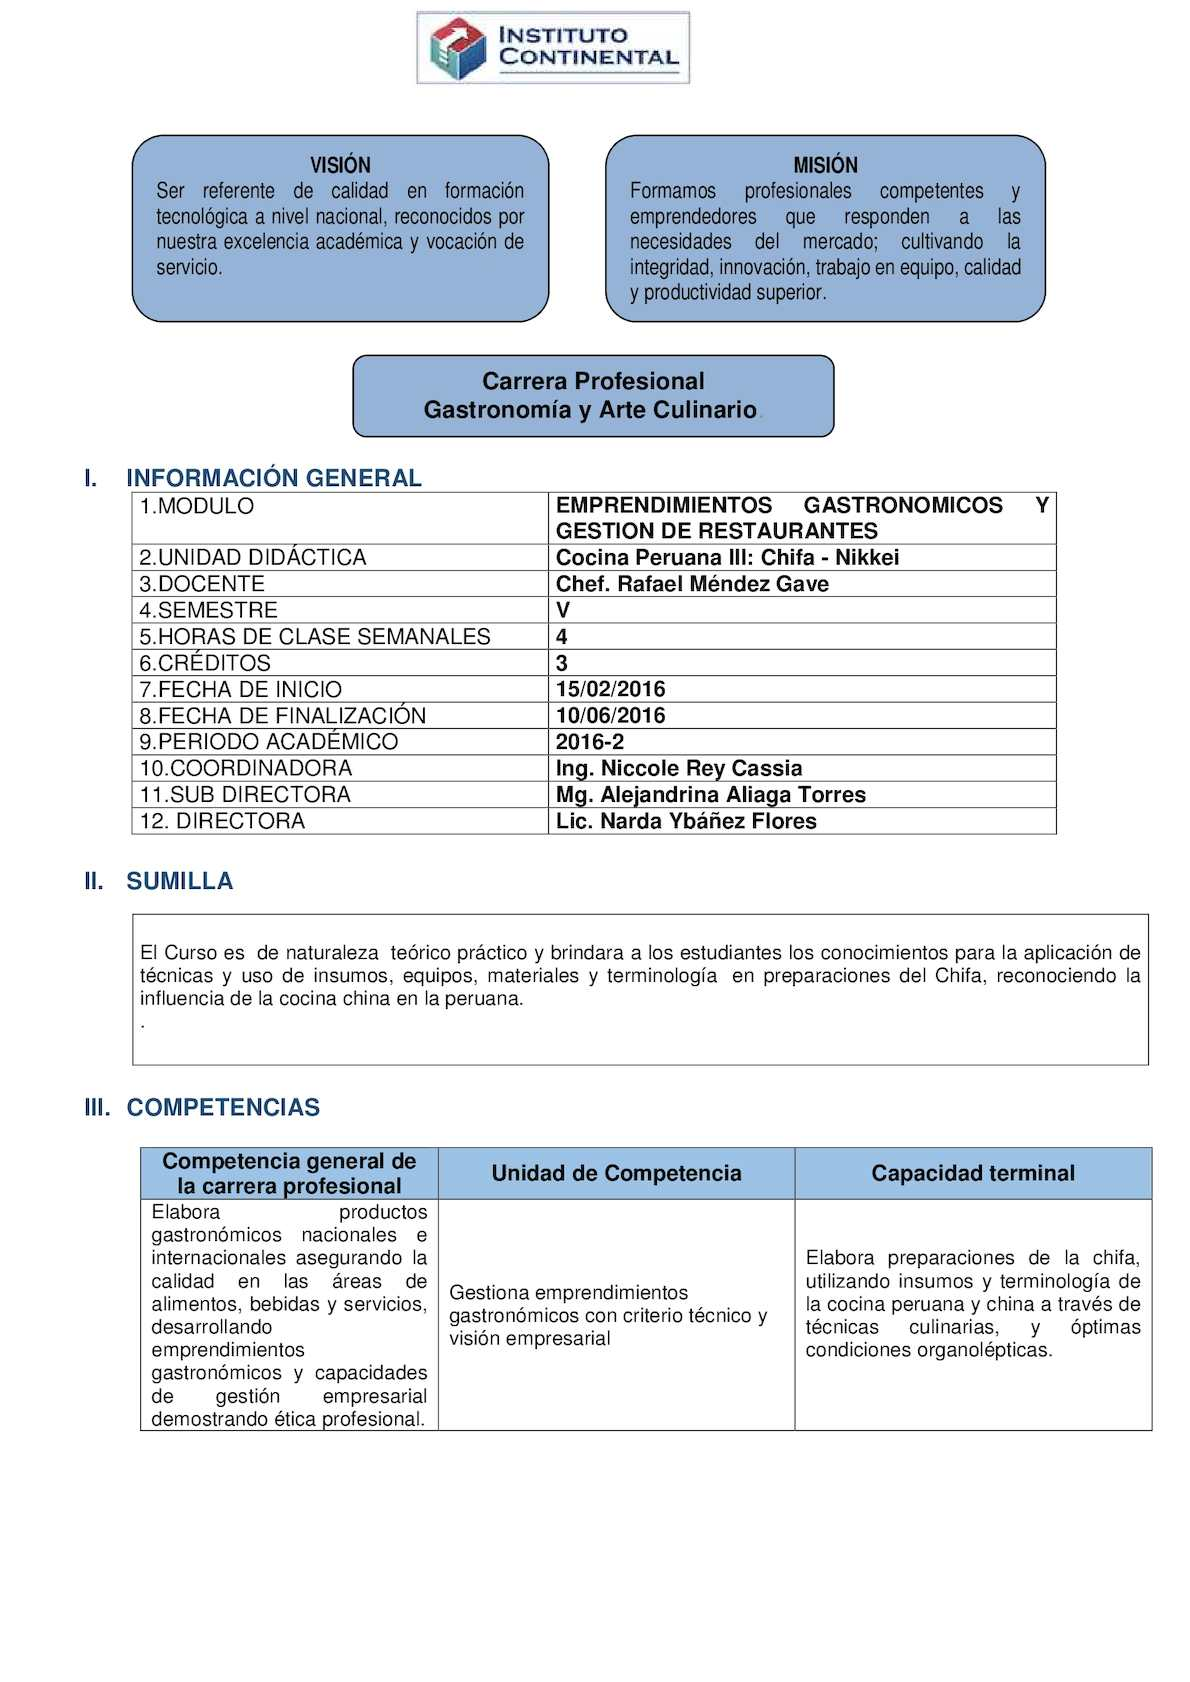 Calam o gast 5to cocina peruana iii chifa nikkei for Lista de materiales de cocina